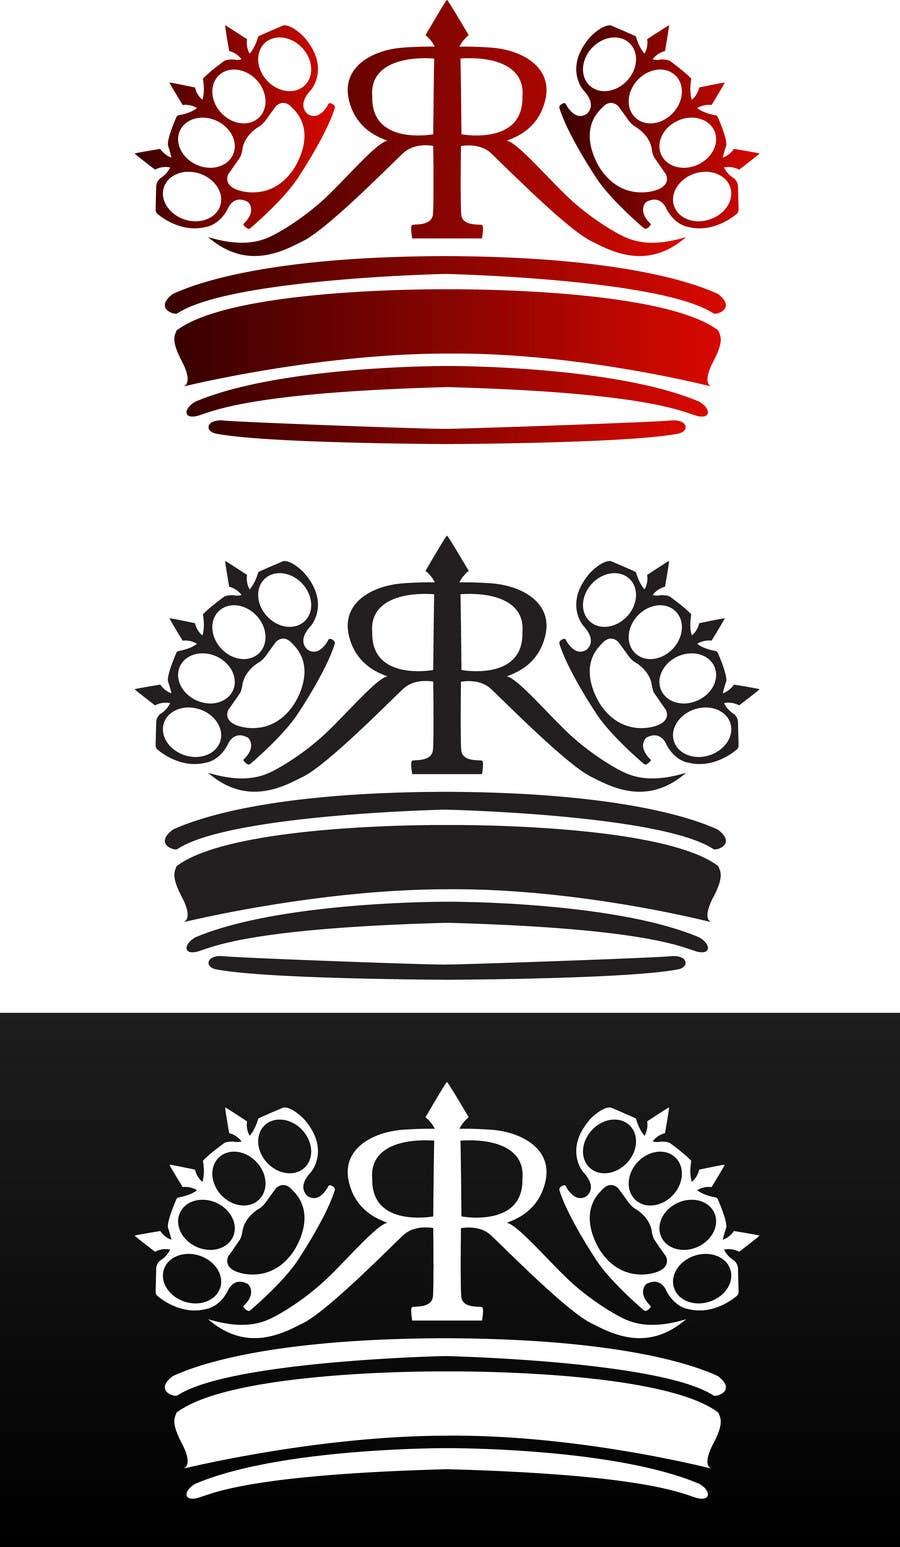 Kilpailutyö #324 kilpailussa Logo Design for Rogue Racing